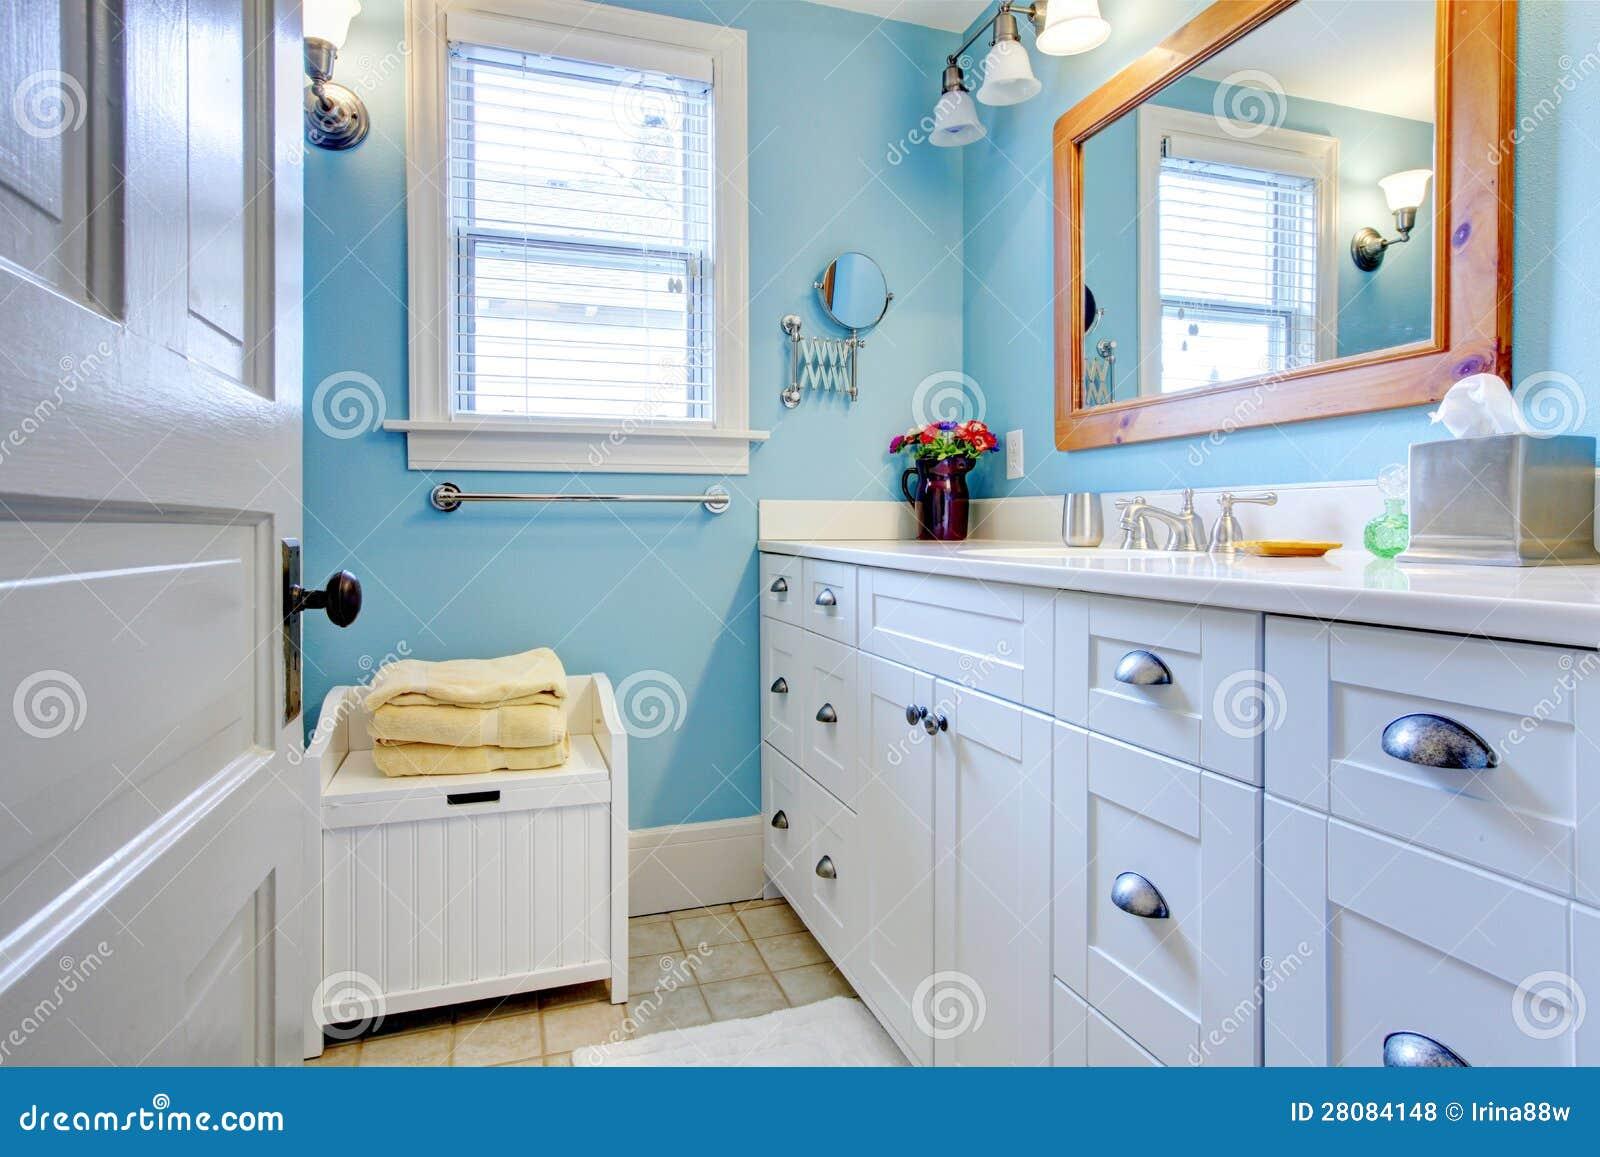 Bagno blu e bianco fotografia stock immagine di casa 28084148 - Bagno blu e bianco ...